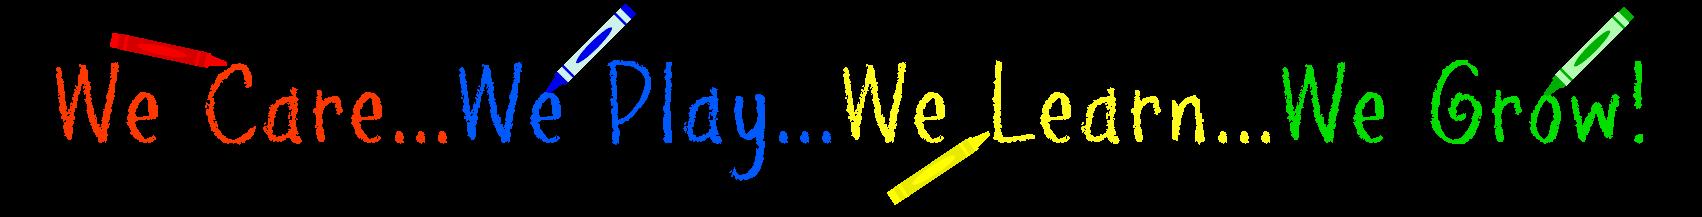 Website design by leslie l. jones